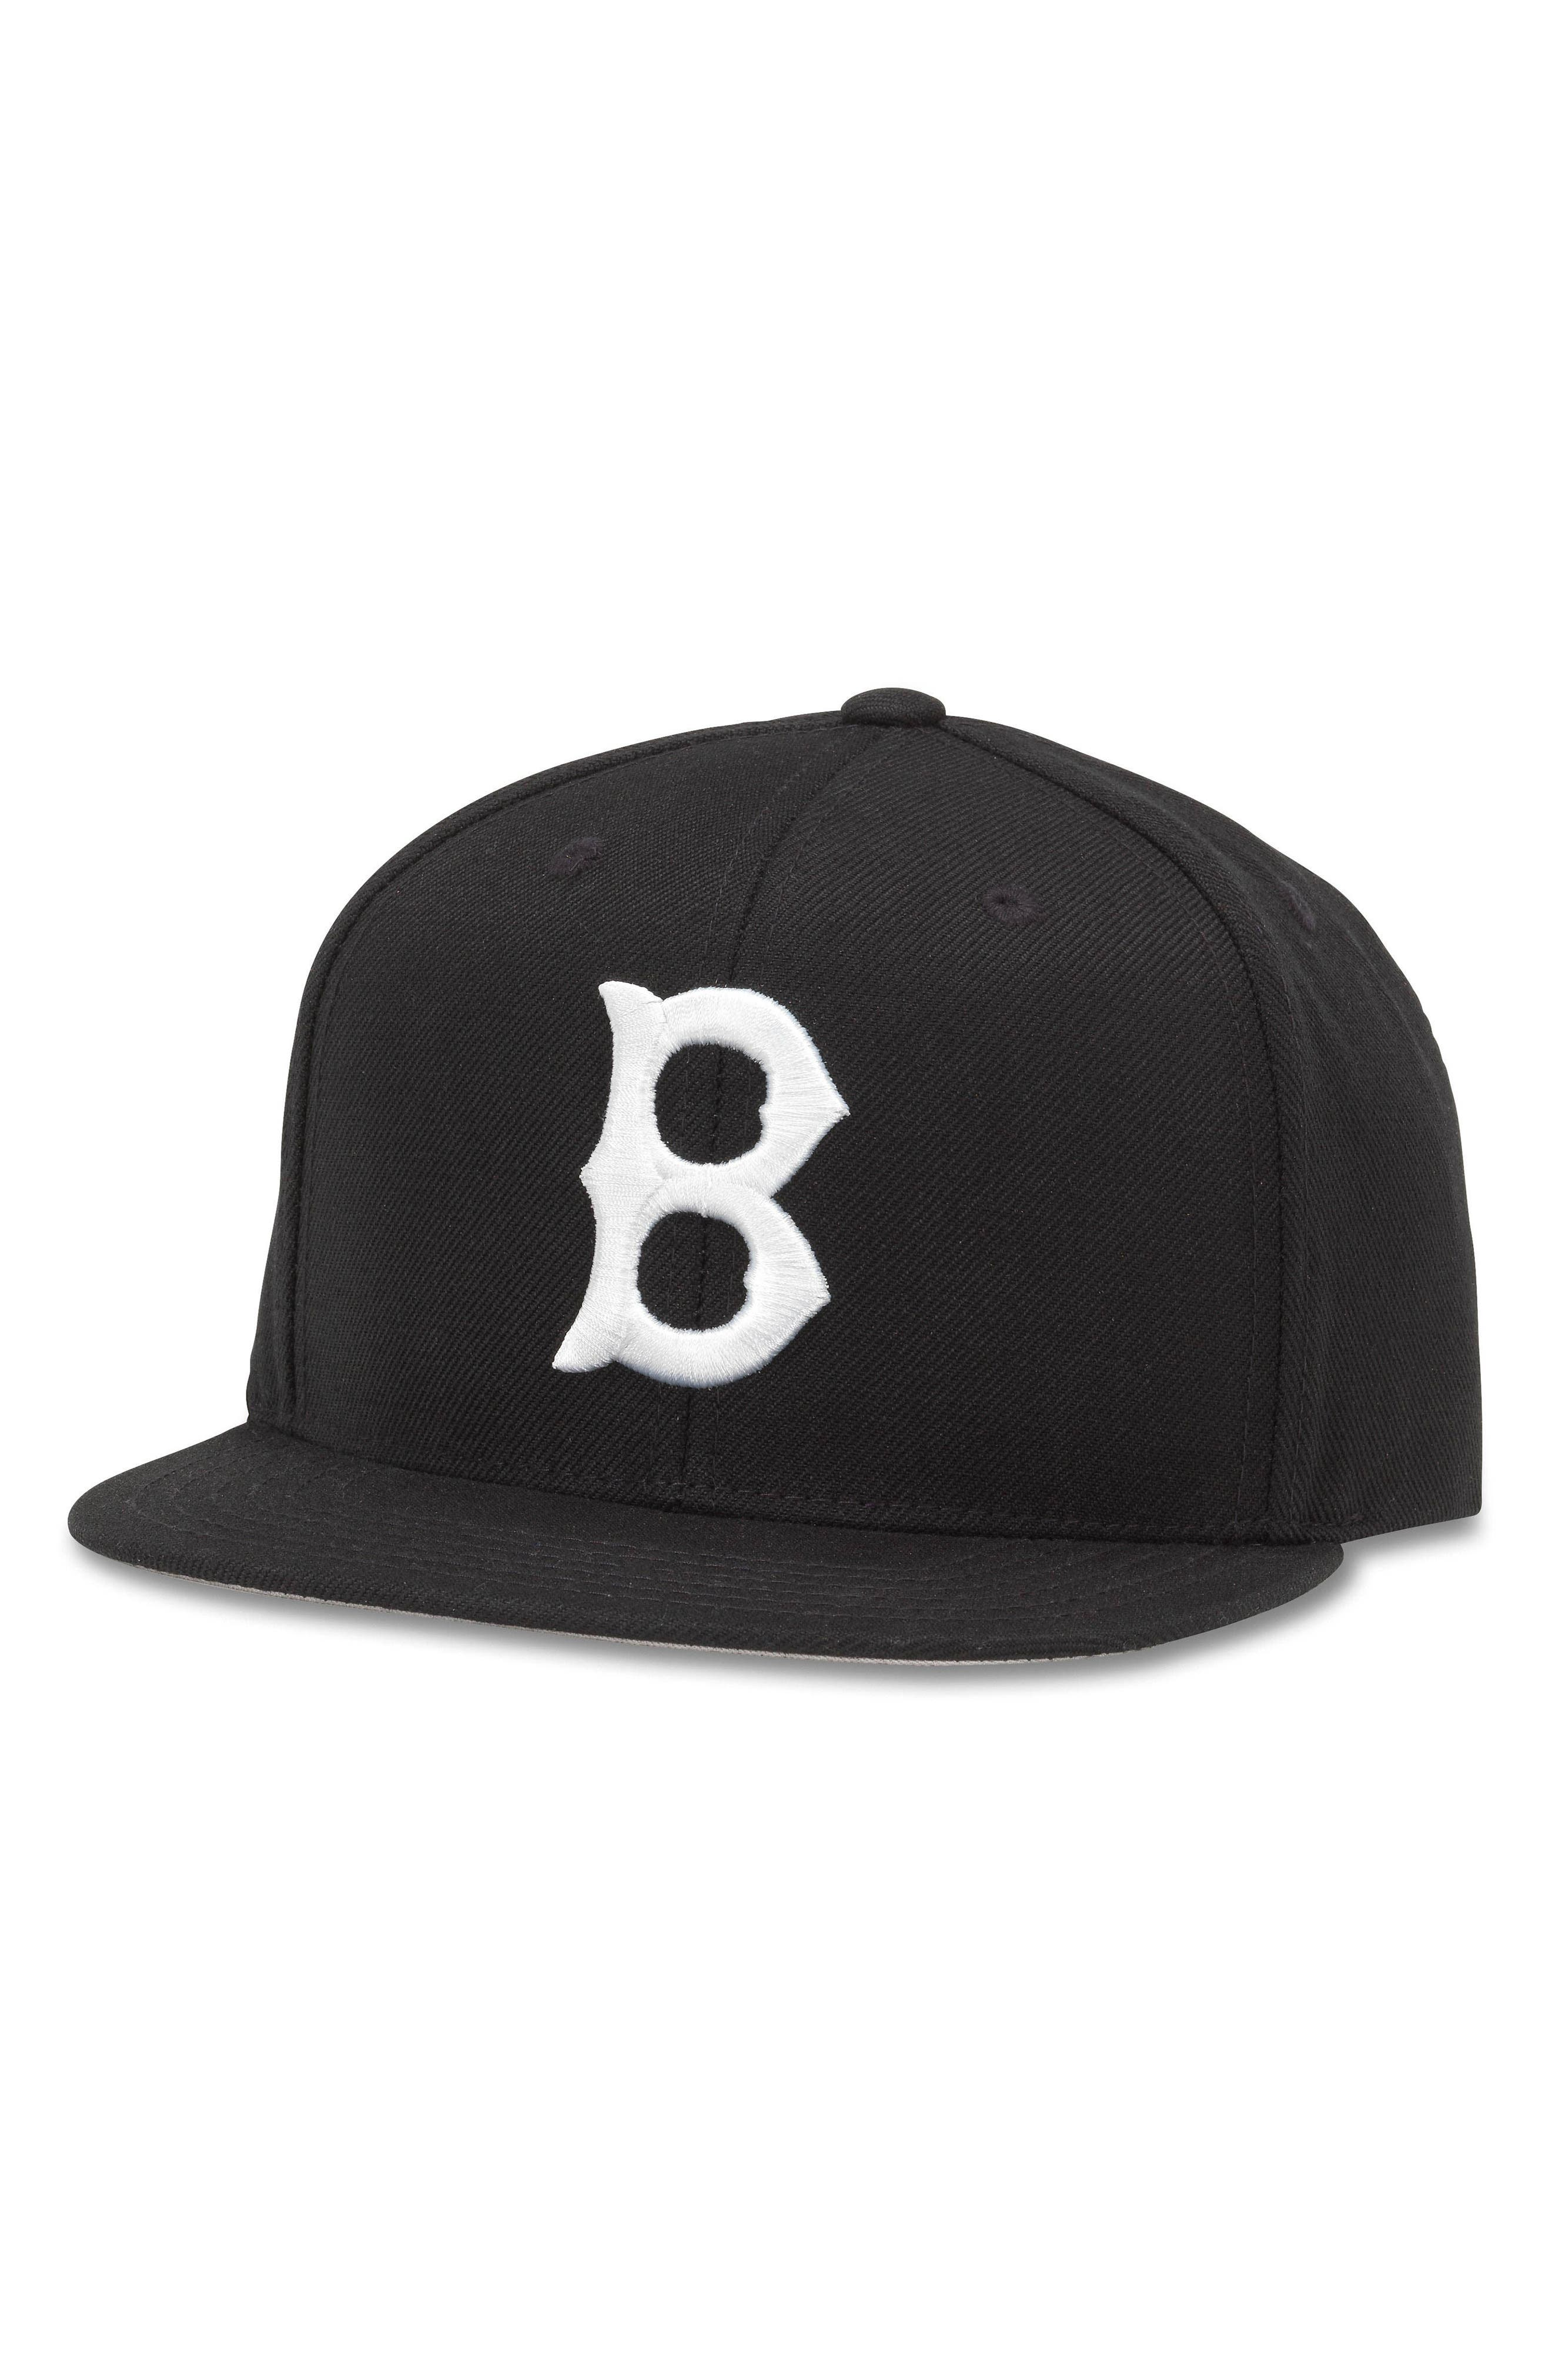 Sideline MLB Baseball Cap,                             Main thumbnail 1, color,                             001